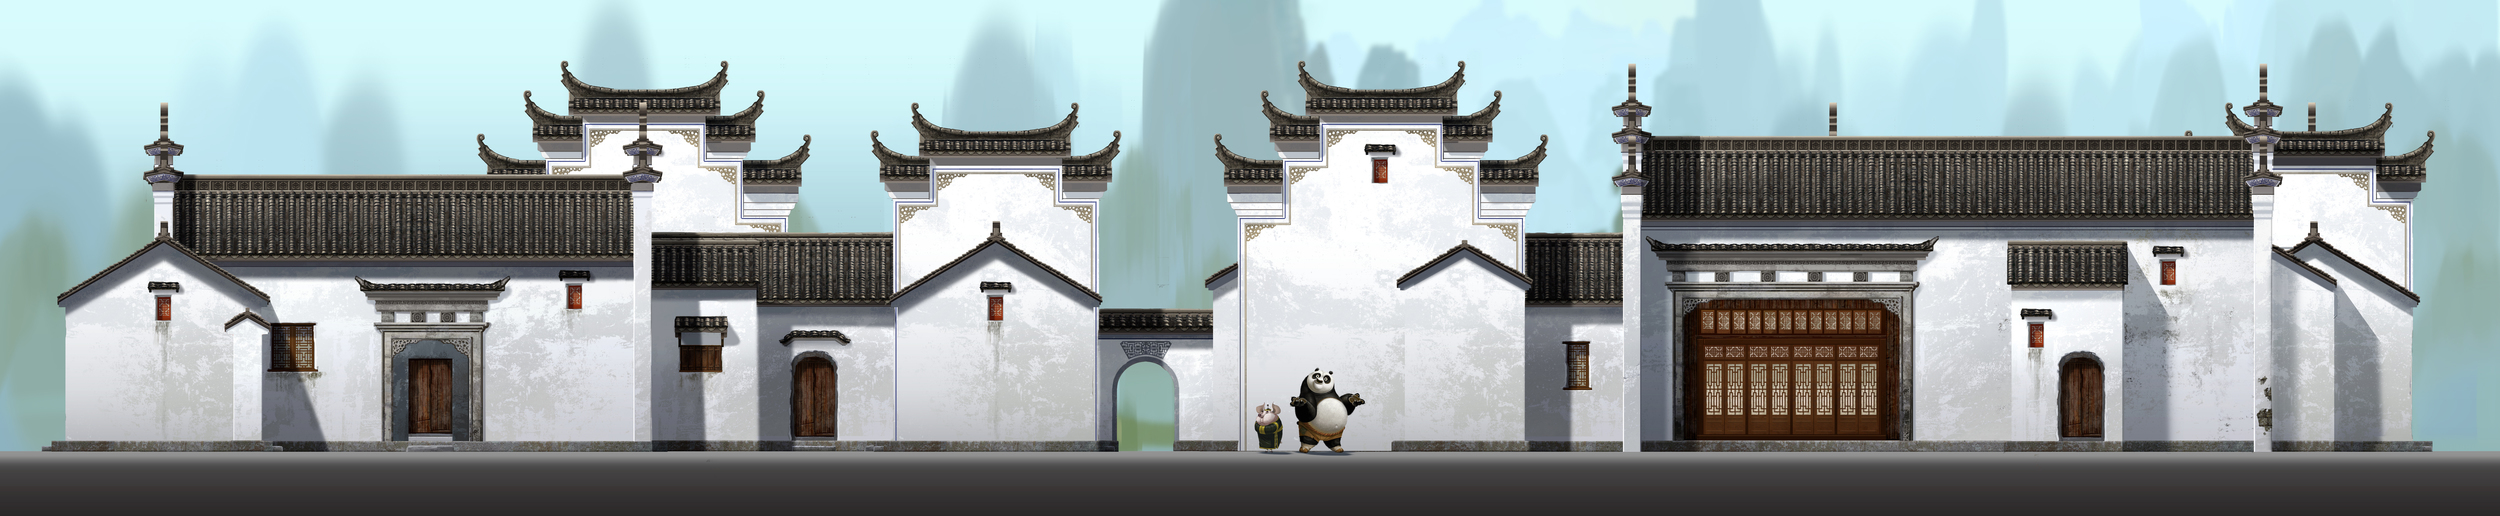 Kung Fu Panda, DWA Po's neighborhood - Building design